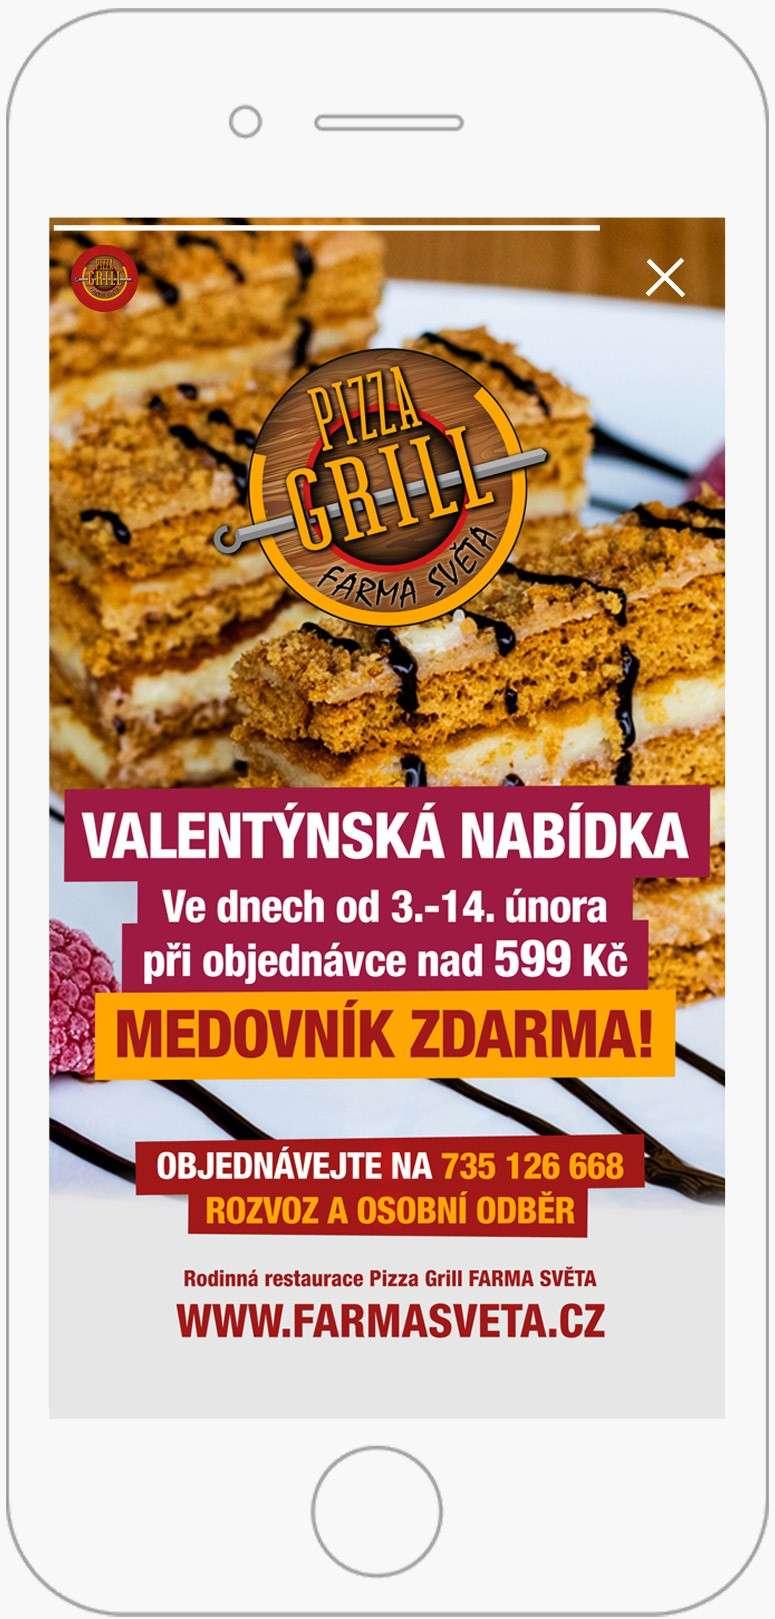 clubadvisor_reference_pizzagrillfarmasveta_on-line-marketing_instagram-single